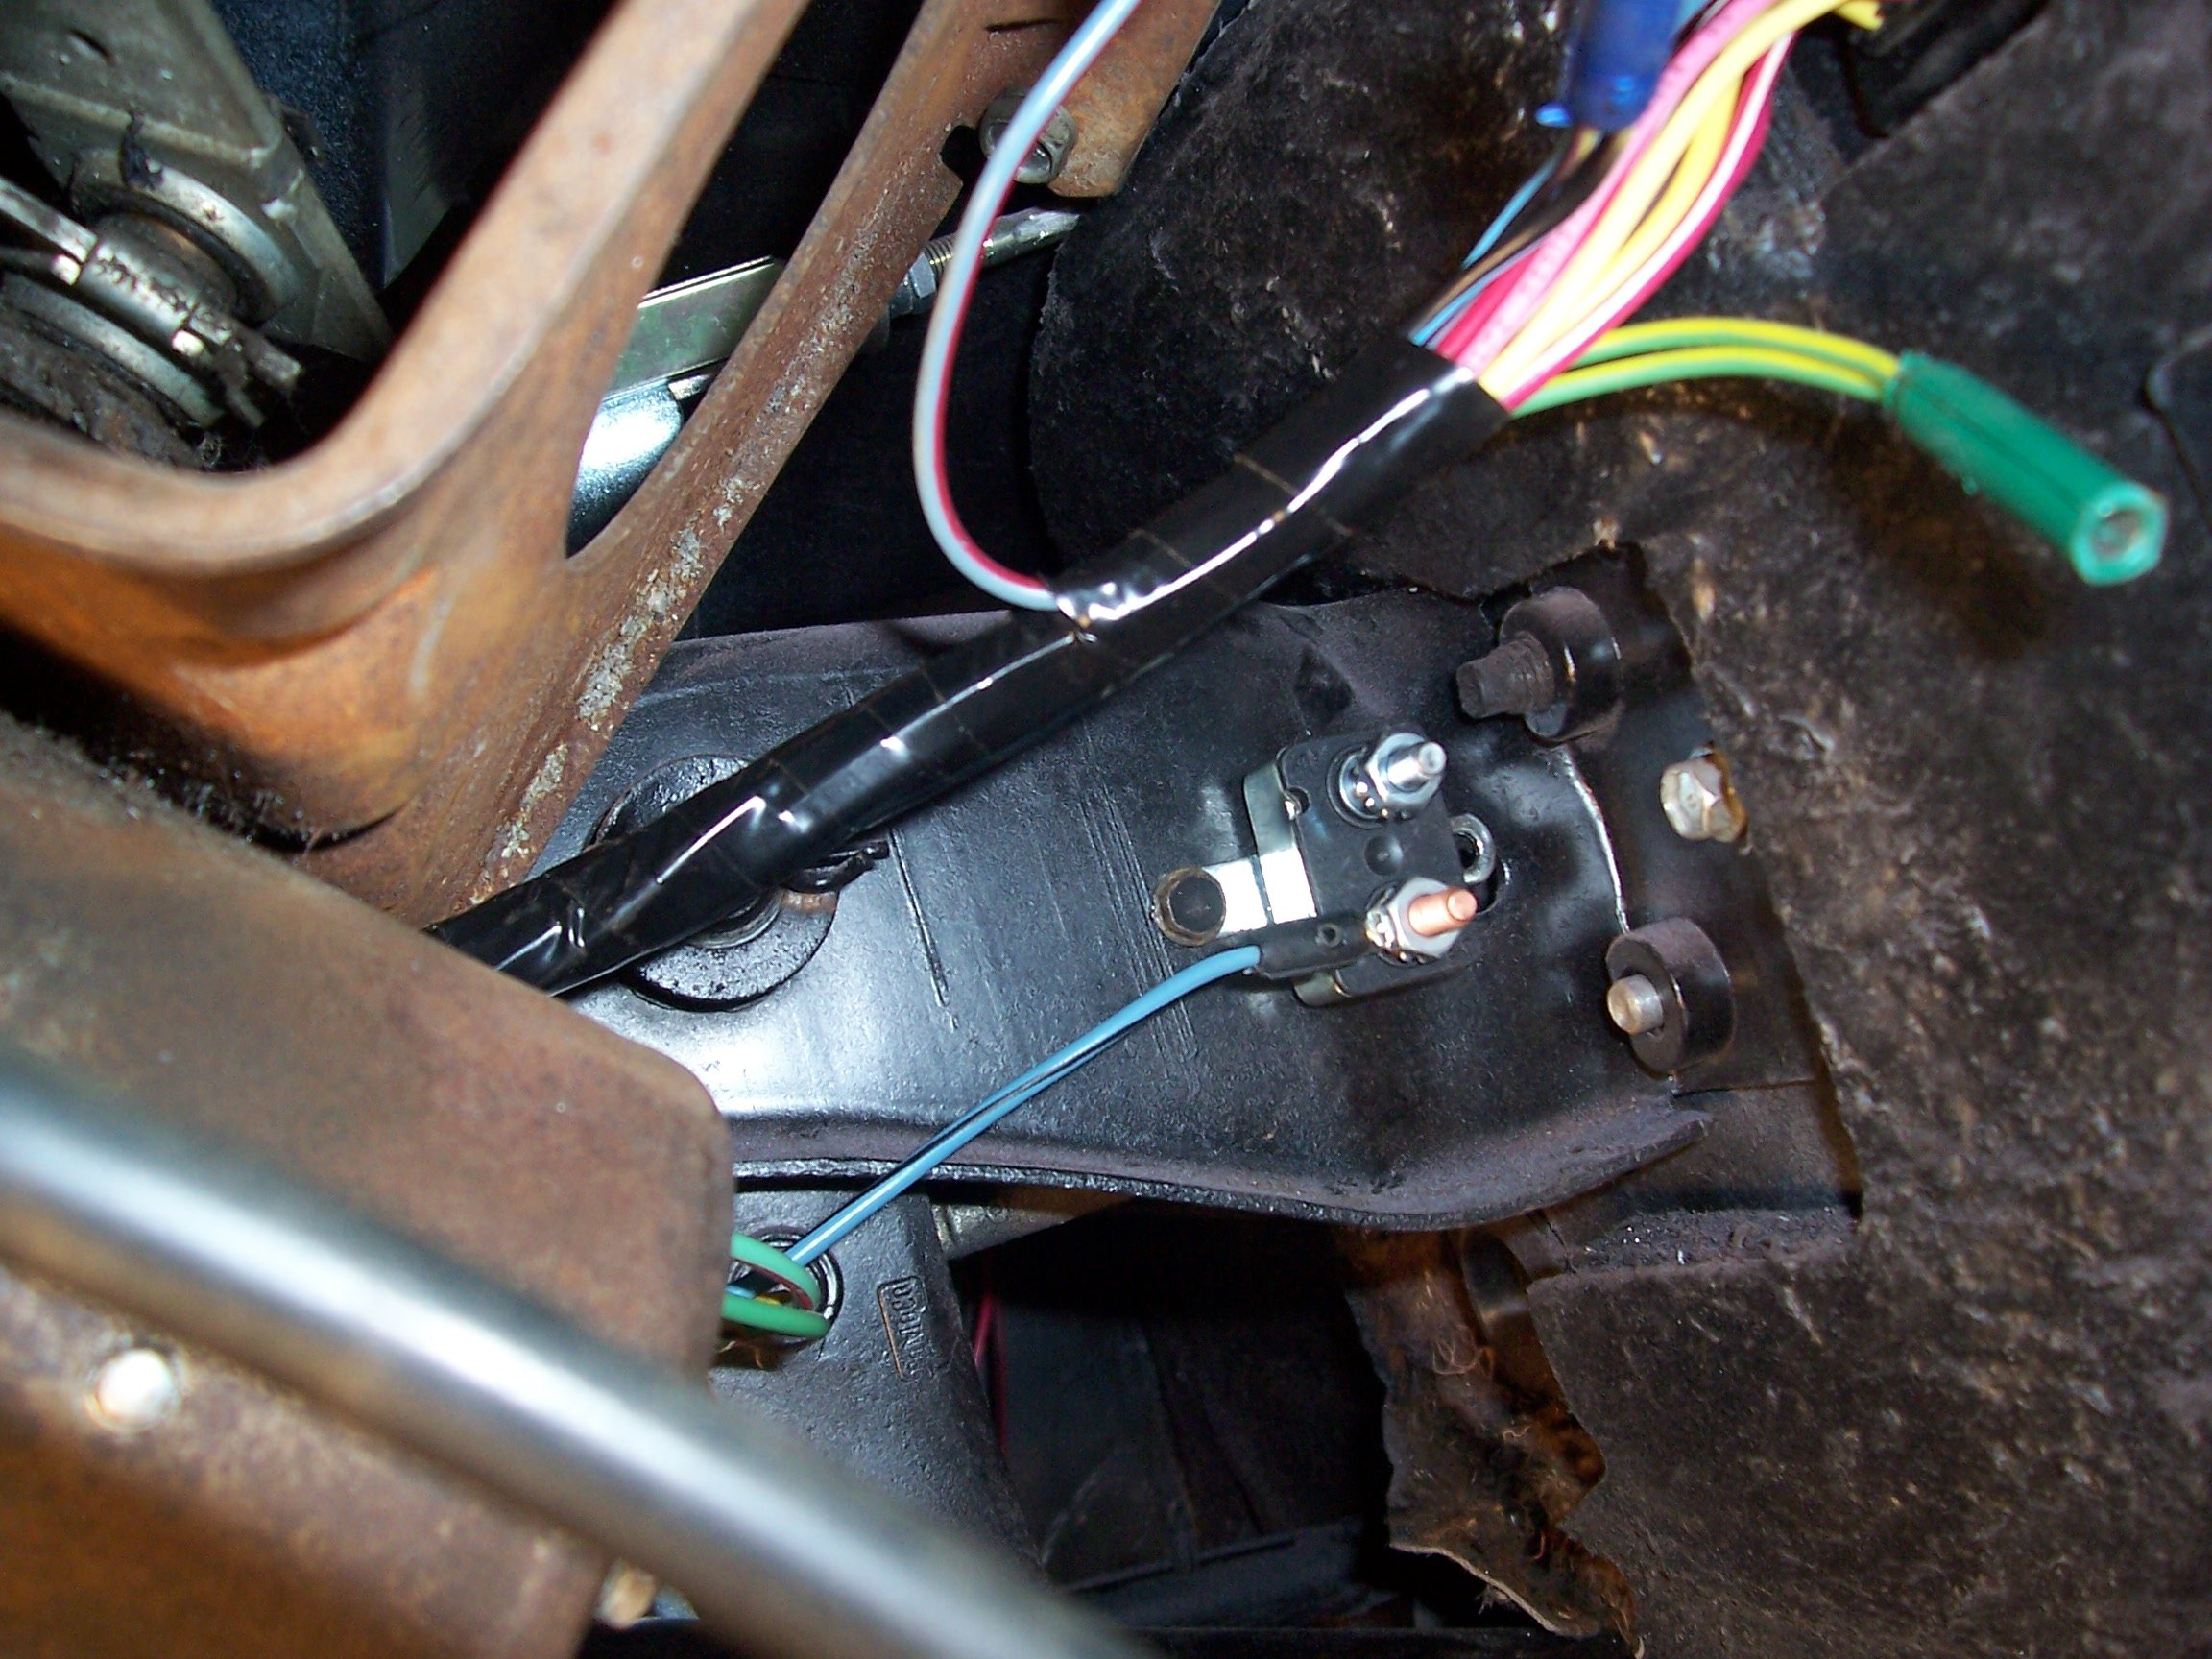 66 Fastback Fog Light Wirng Kit Ford Mustang Forum